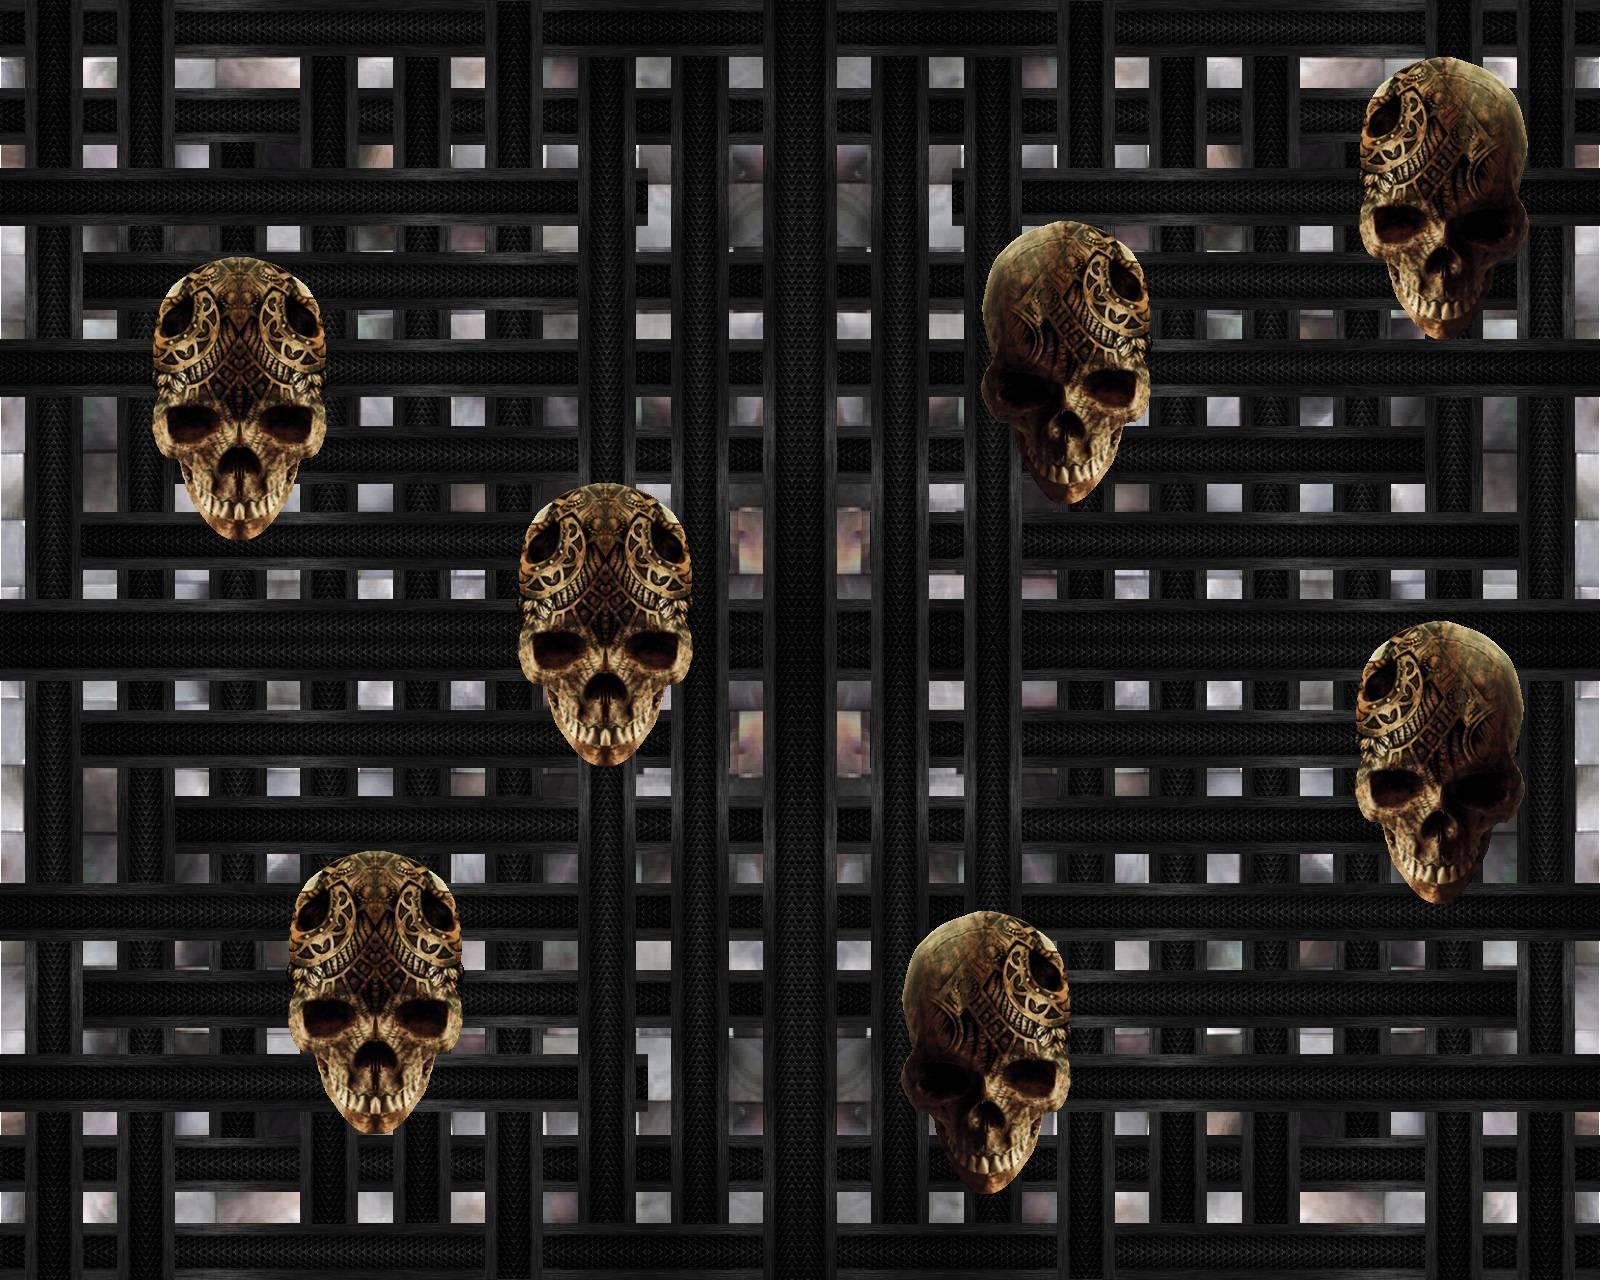 Bars and skulls